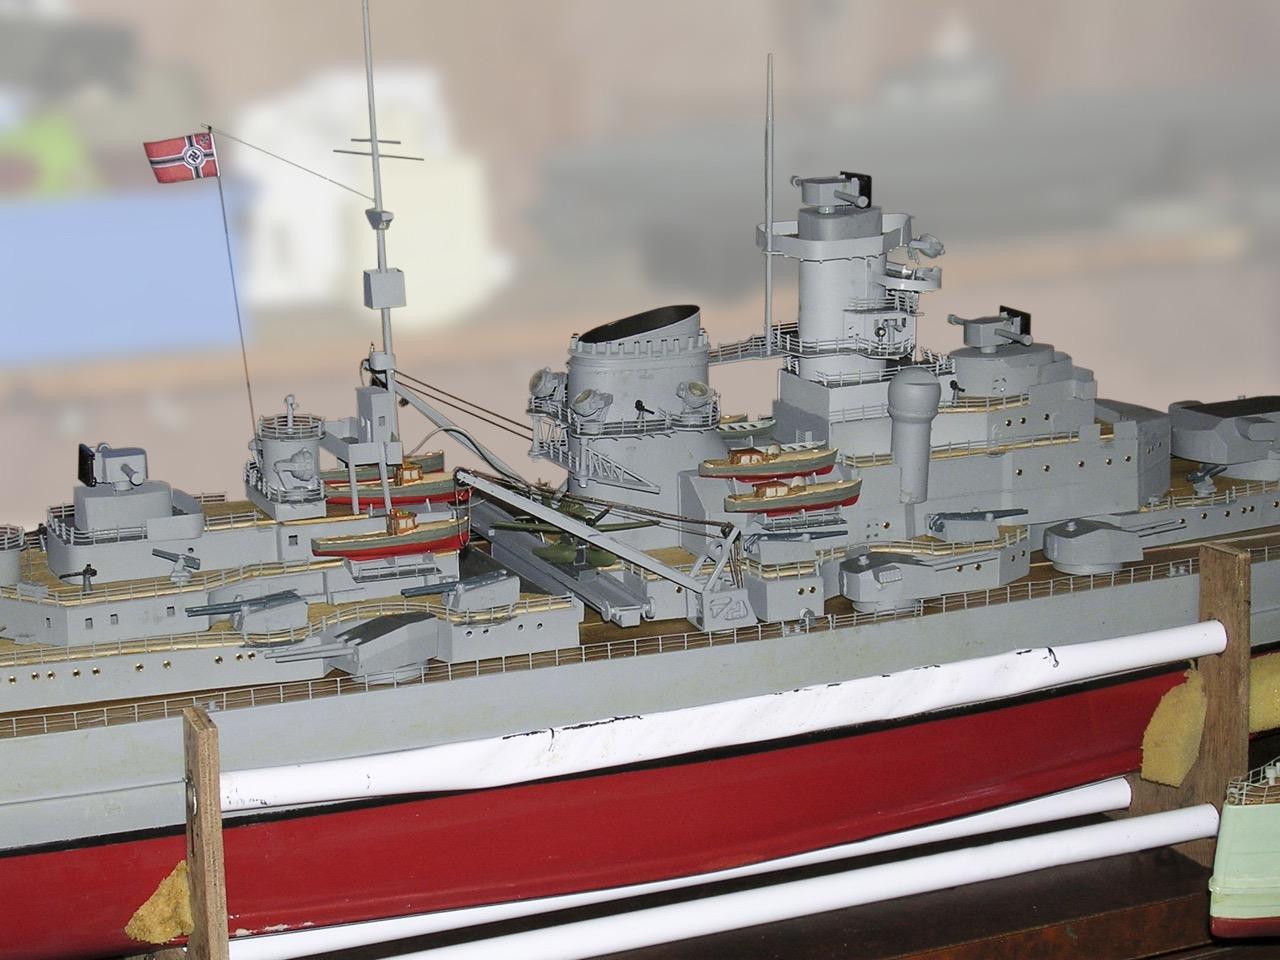 KM Bismarck (from Archie Howie)